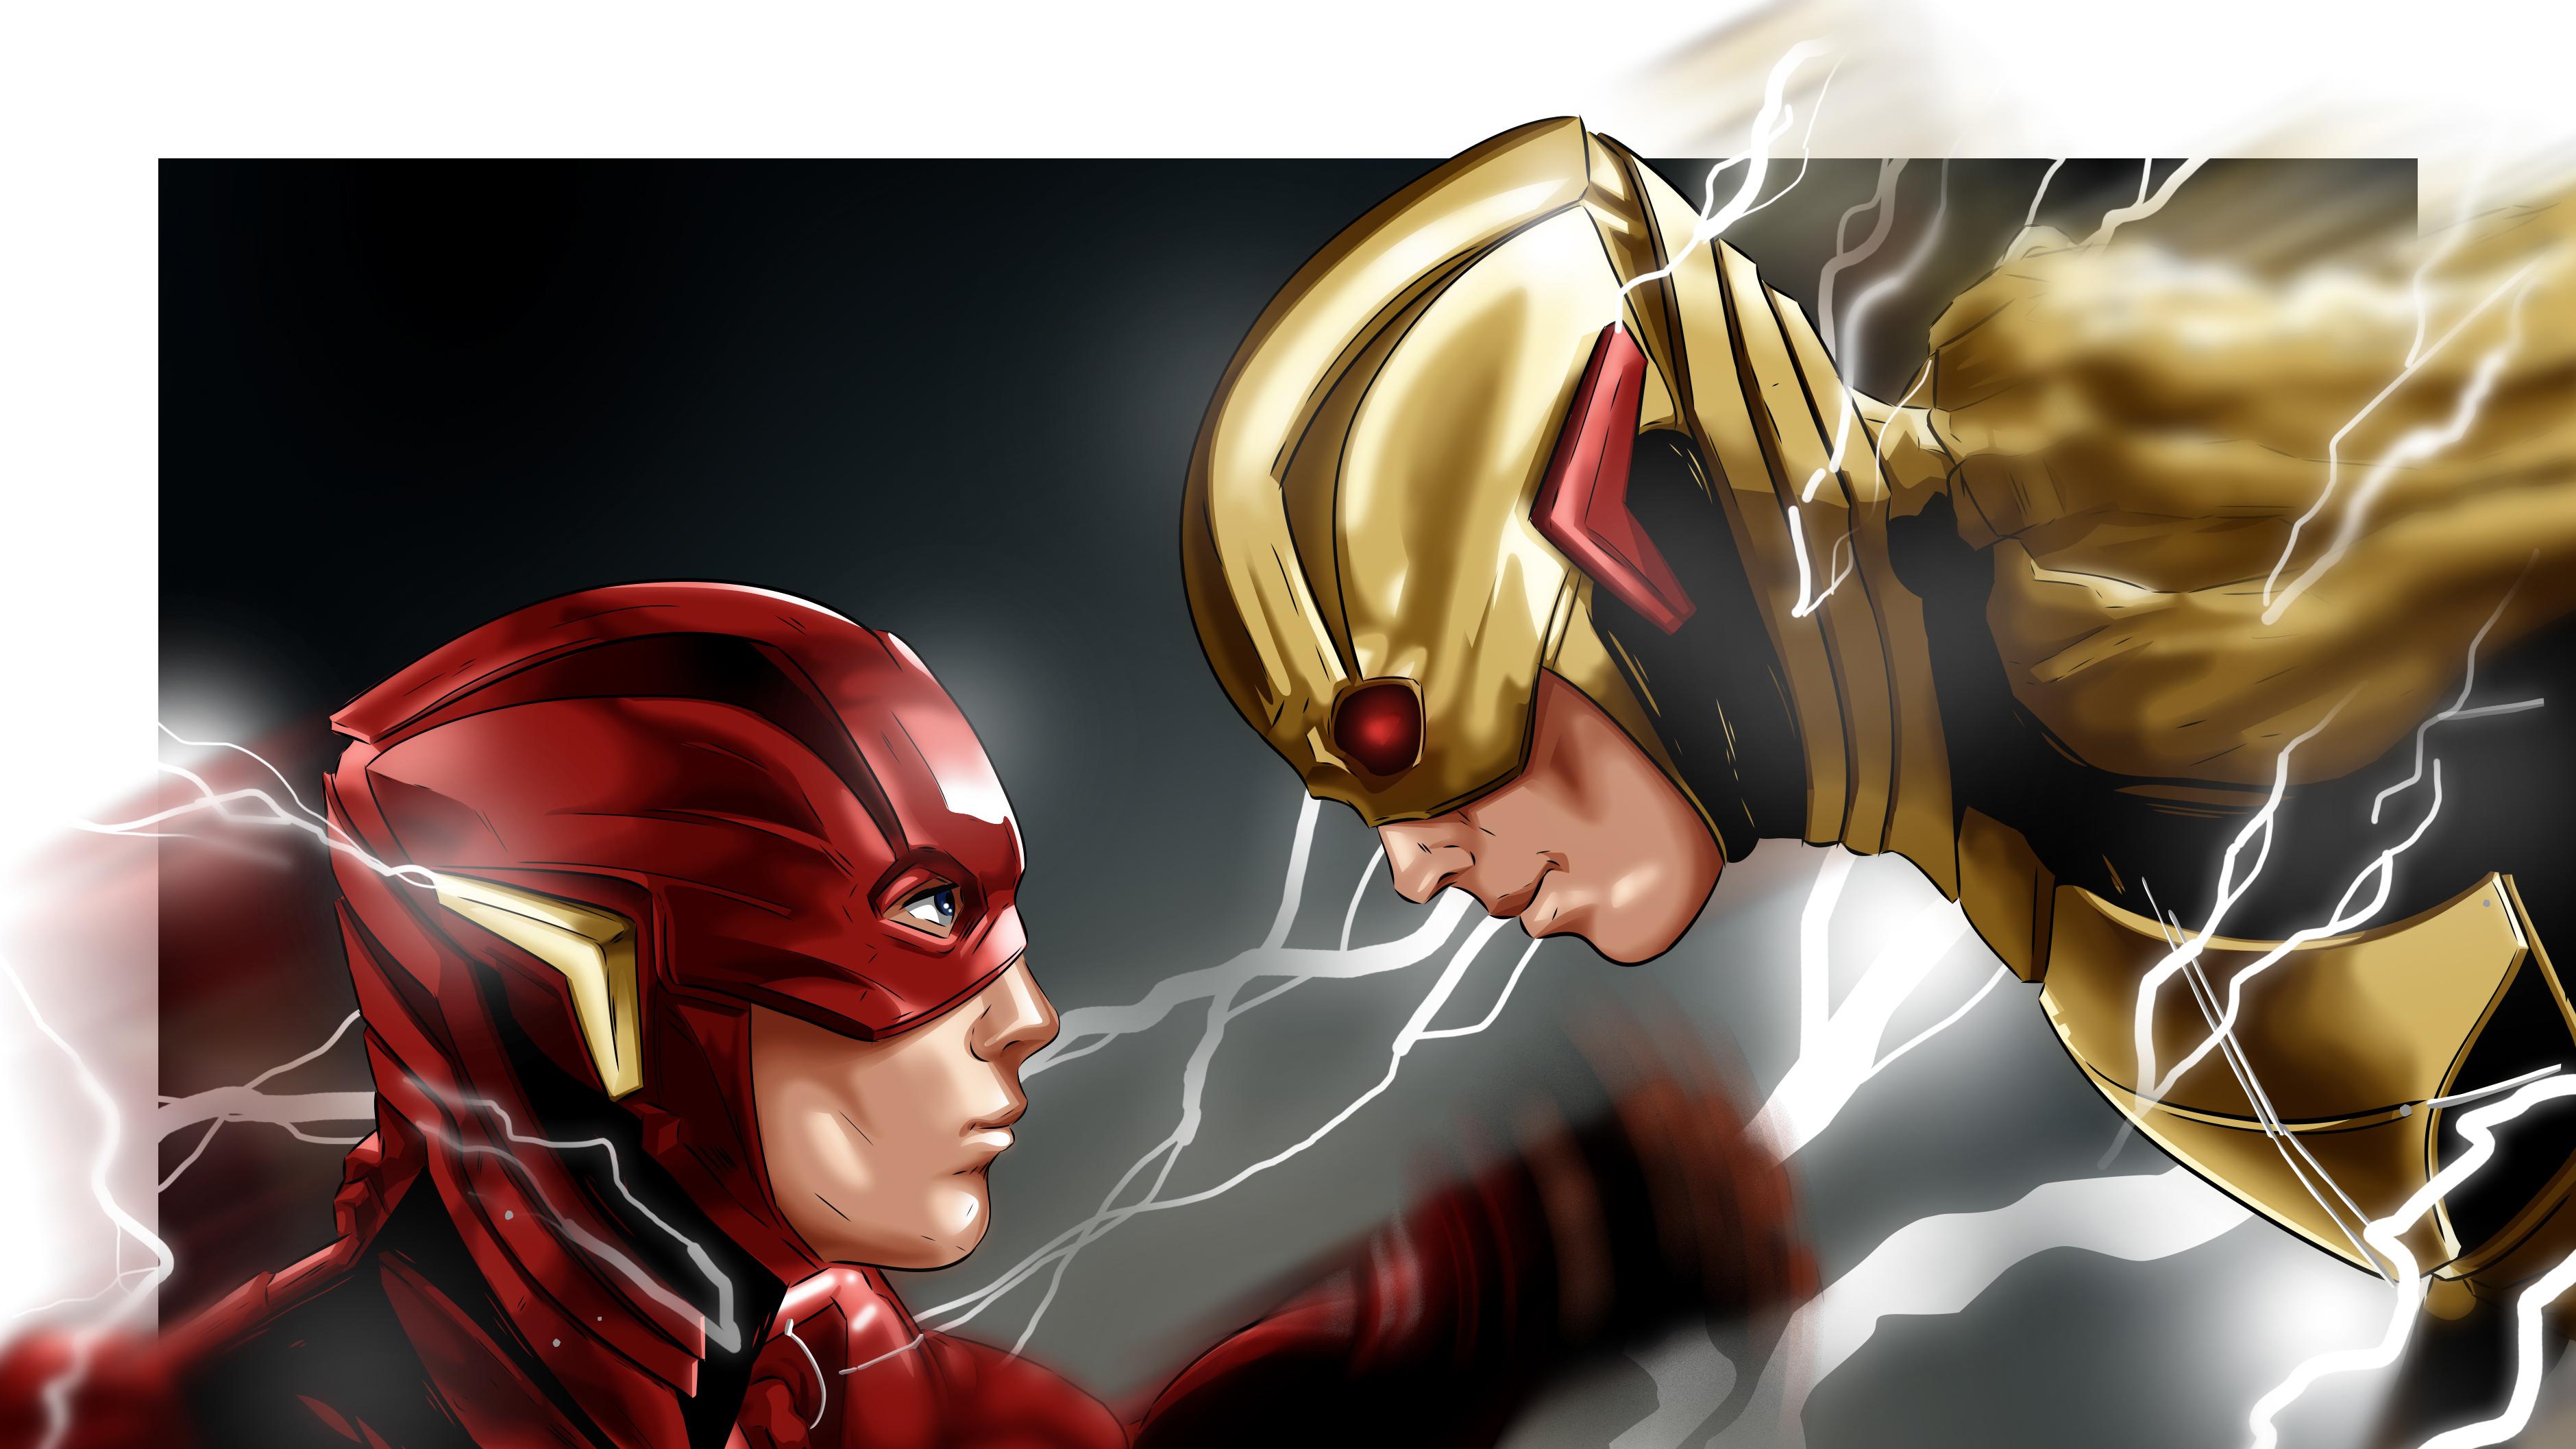 Flash Vs Reverse Flash 4k Hd Superheroes 4k Wallpapers Images